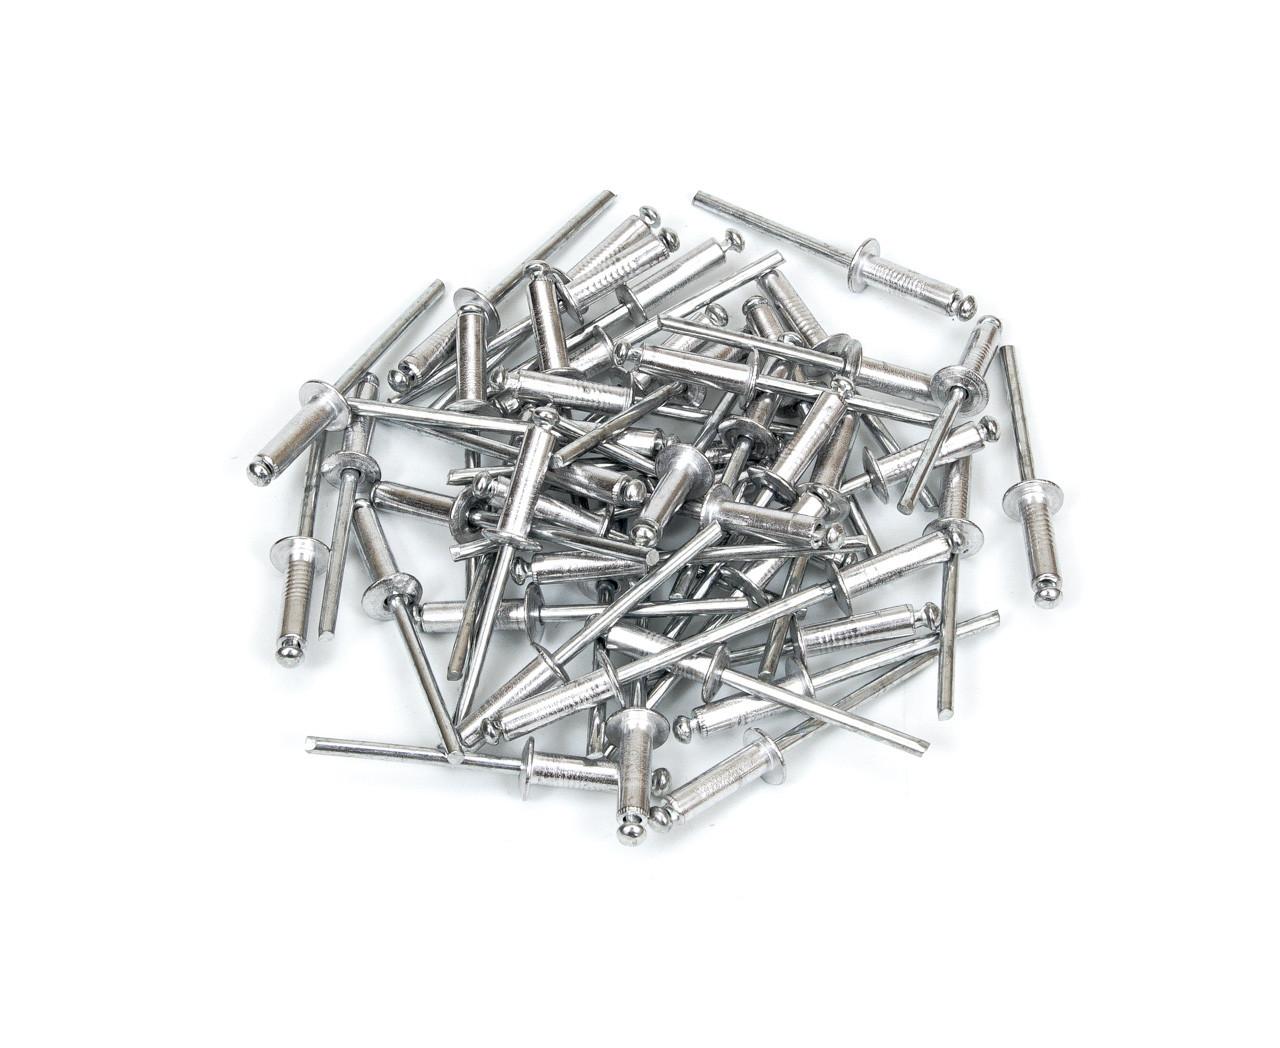 Заклепки алюминиевые Polax 4,8 х 8 мм 50 шт. (37-015)